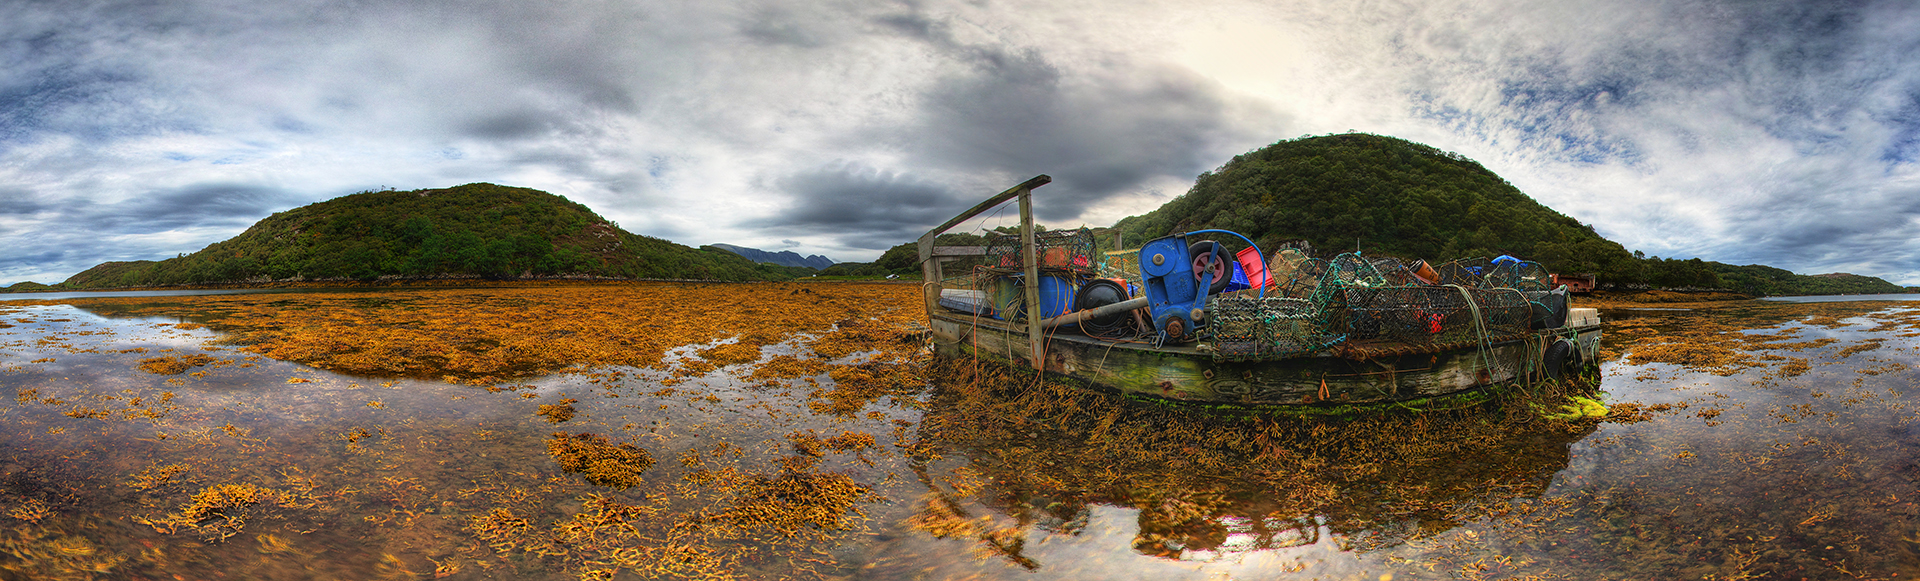 Scotland 360º Panorama by Matt Wright